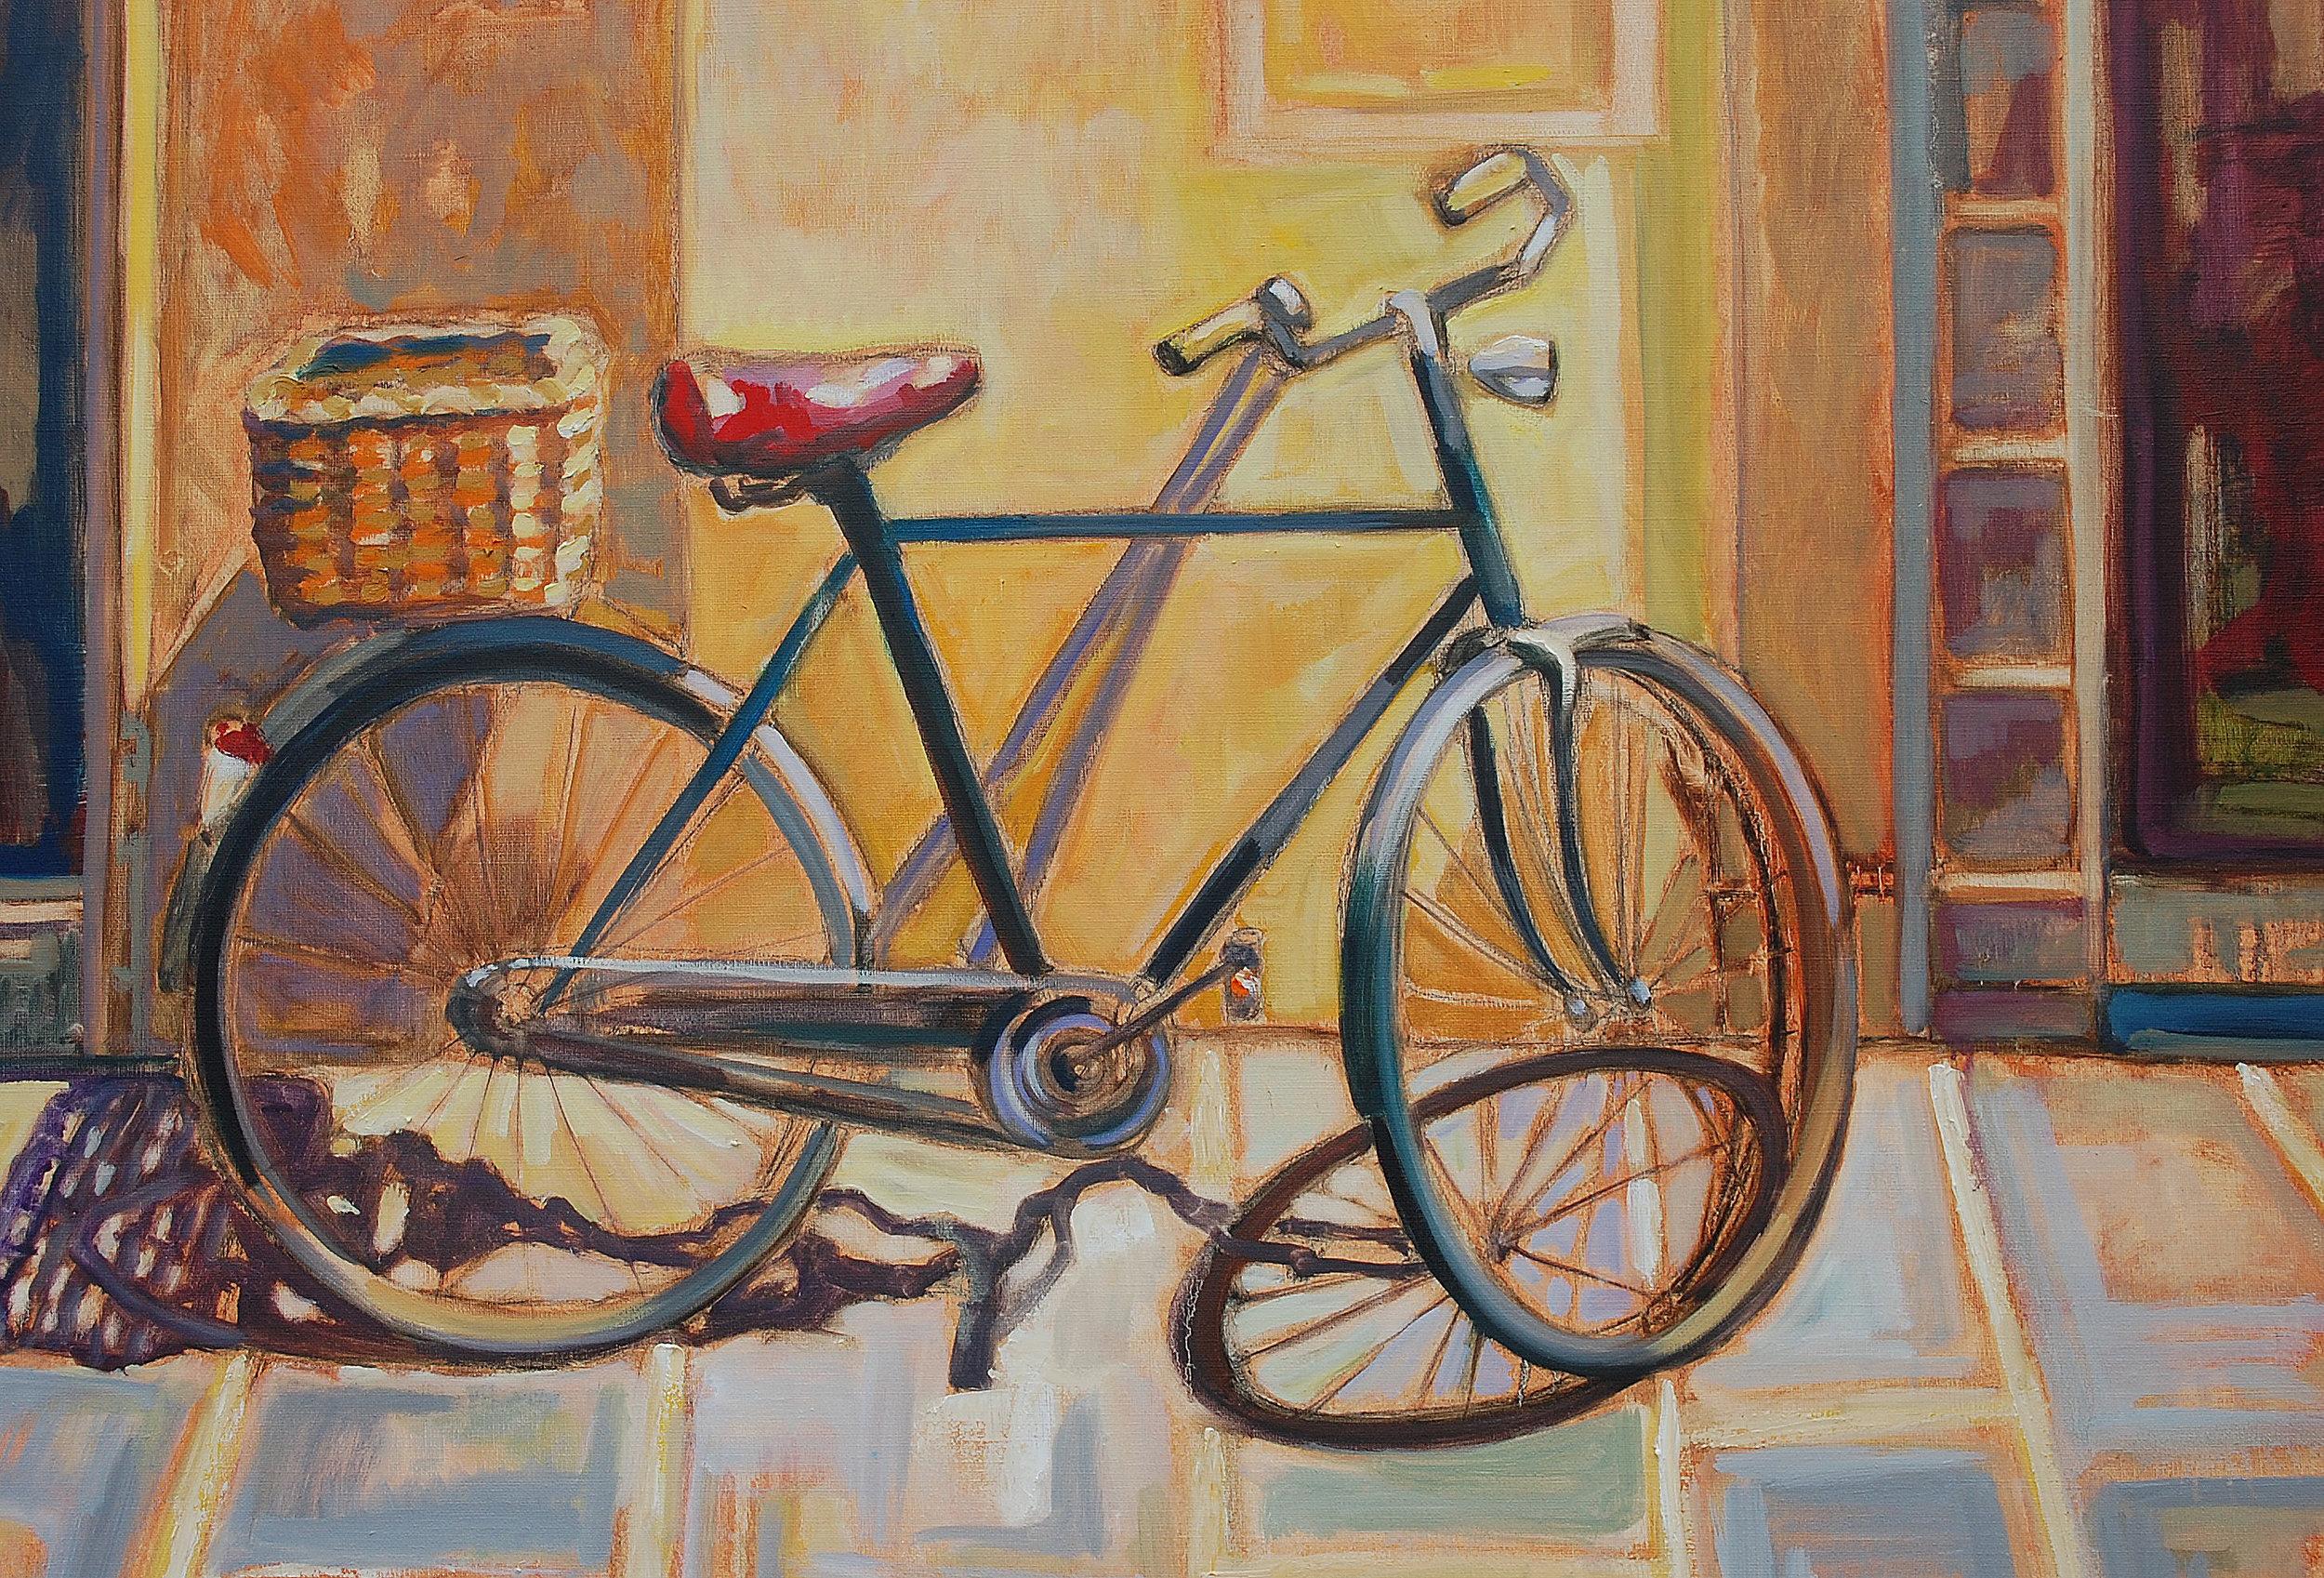 "Bicicletta 30"" x 40"" oil on linen"